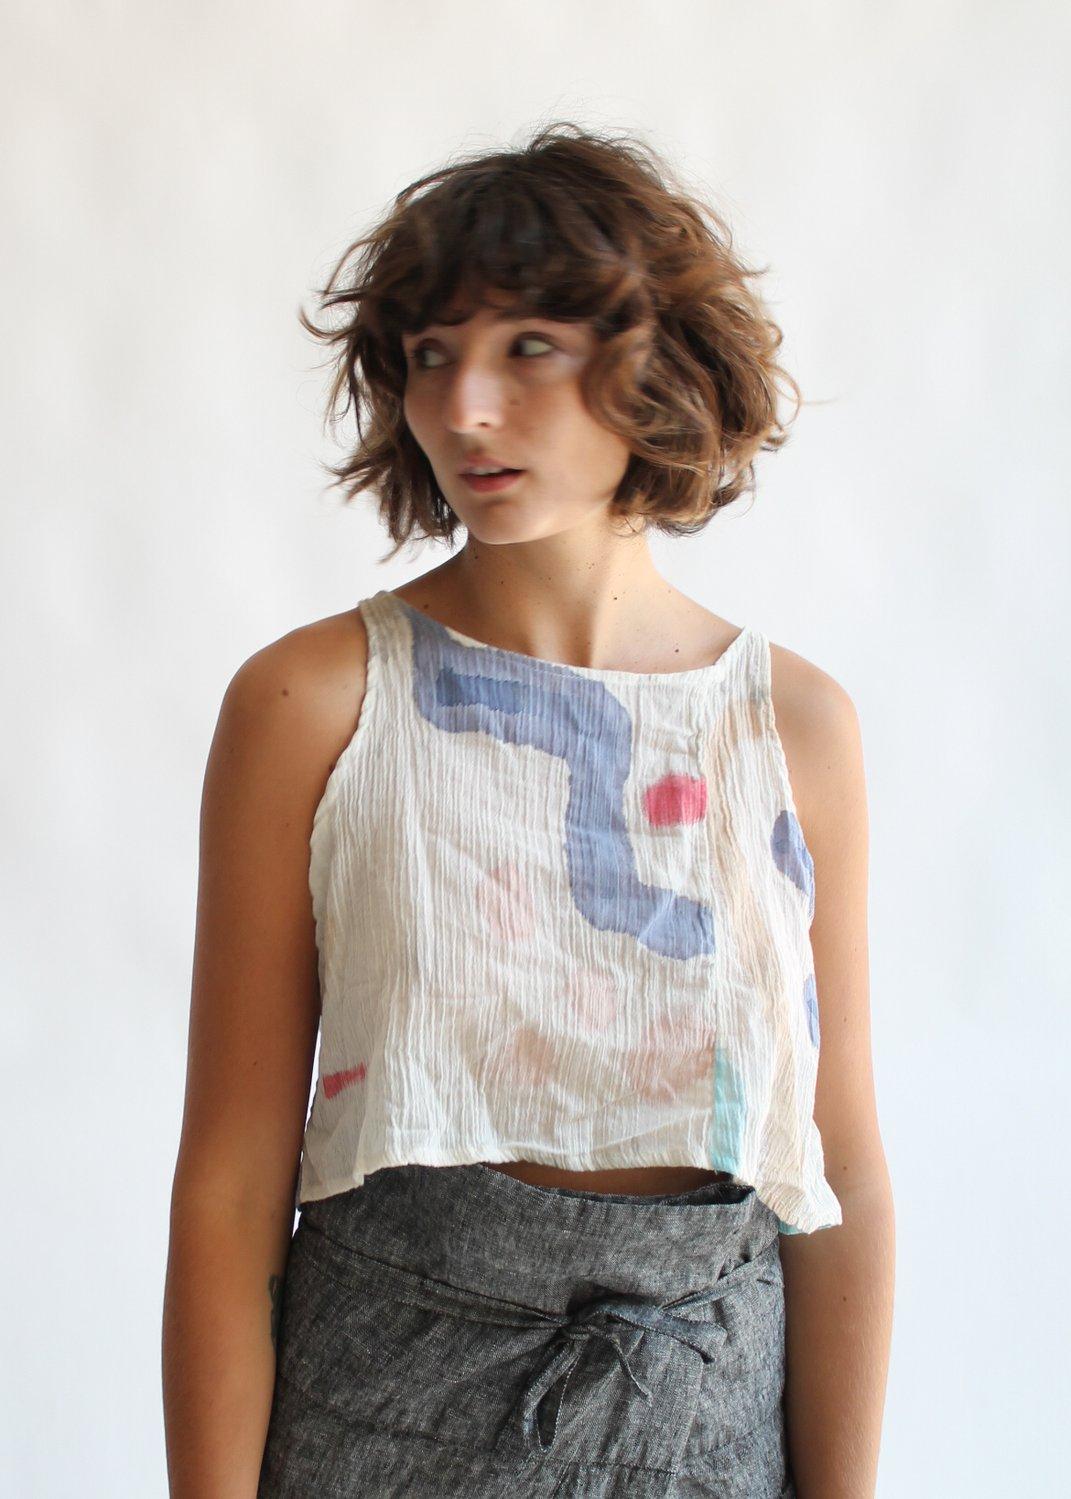 clothing-122_1500x1500.jpg